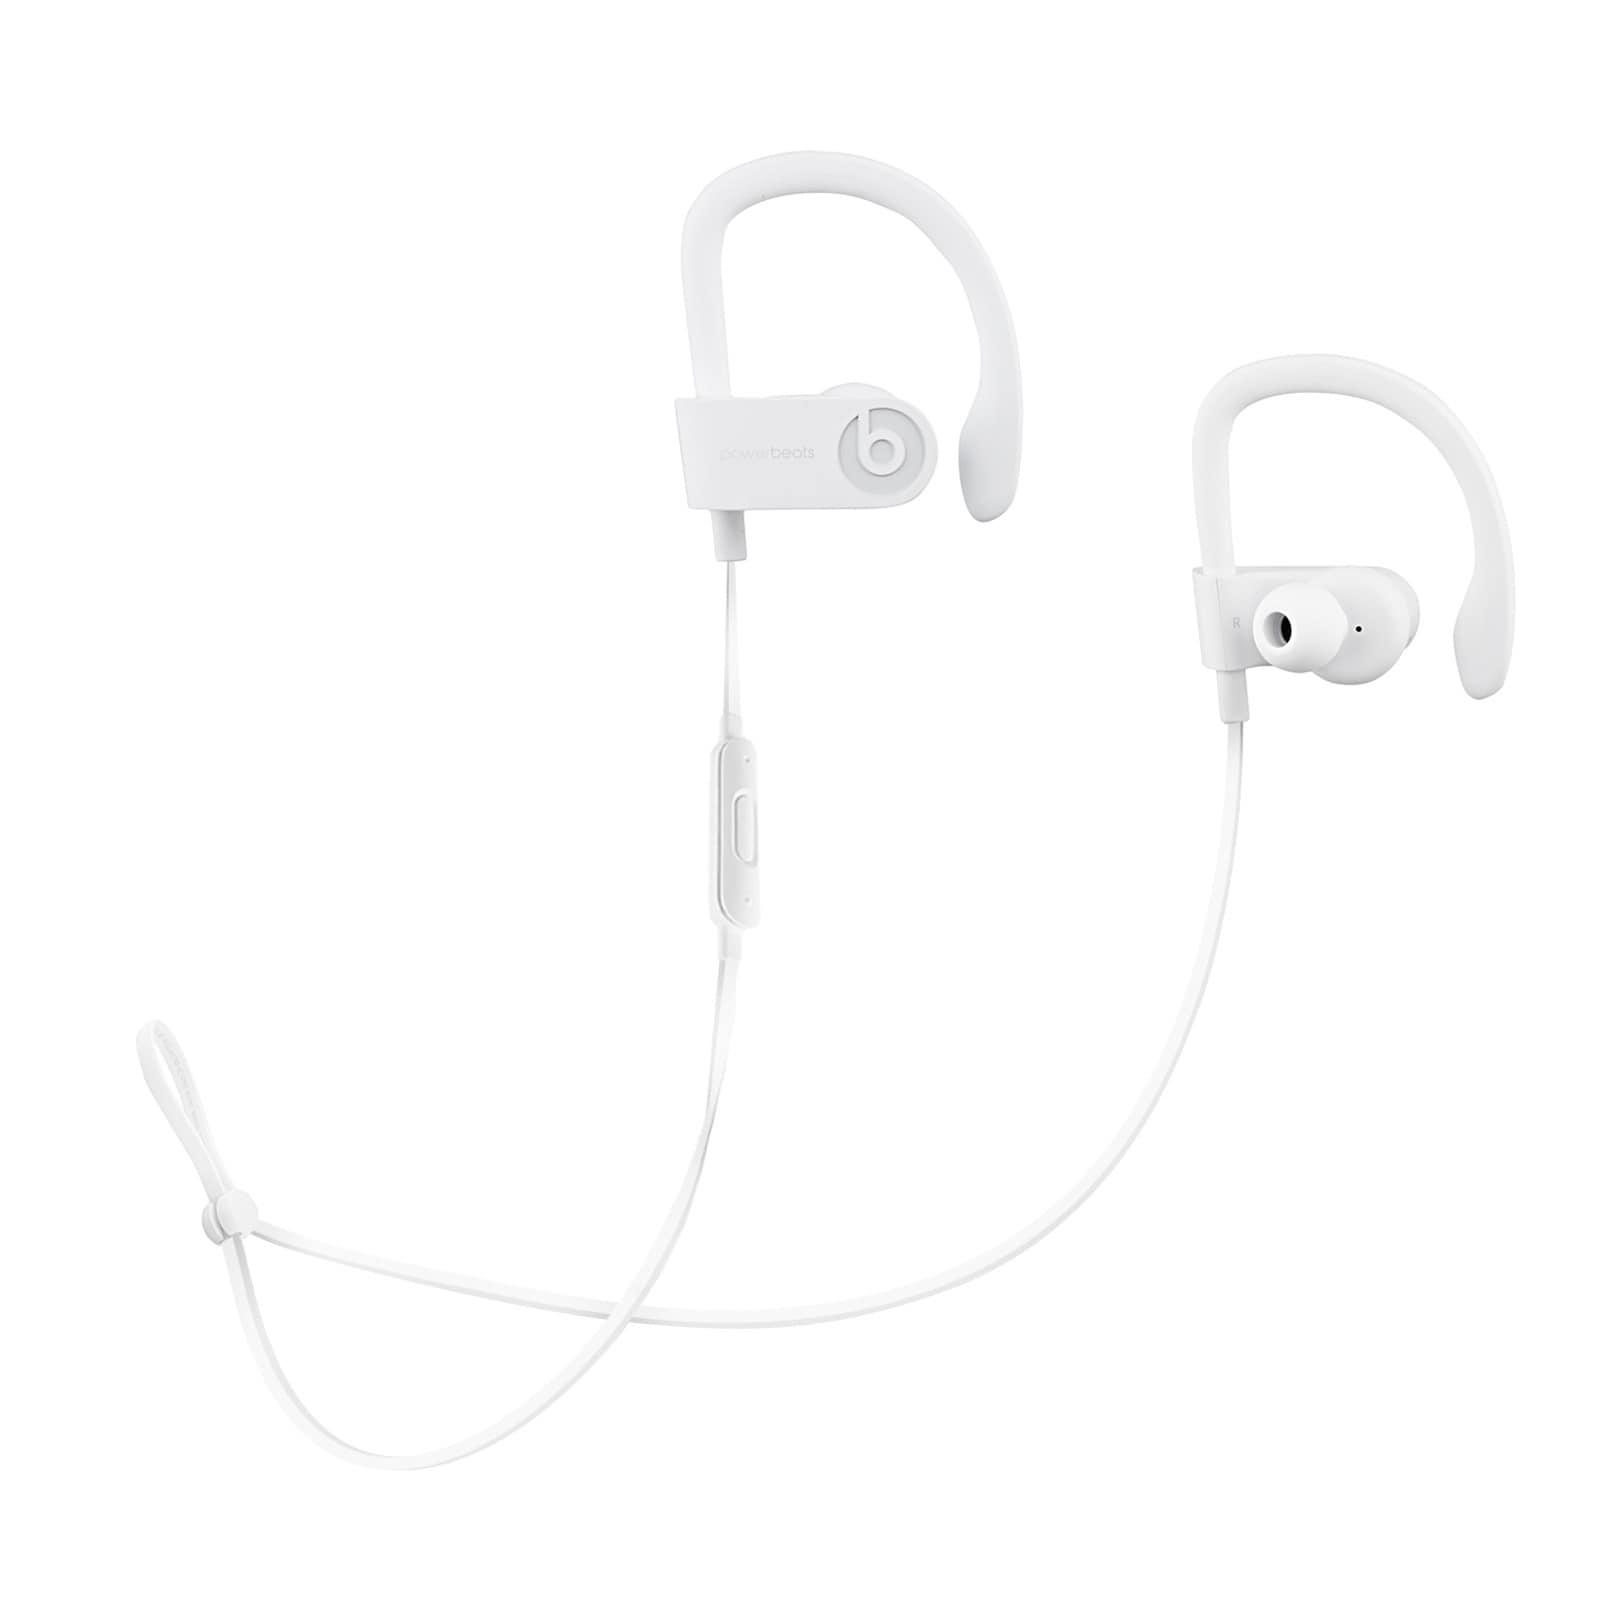 Apple Powerbeats 3 Wireless In Ear Headphones Refurbished White